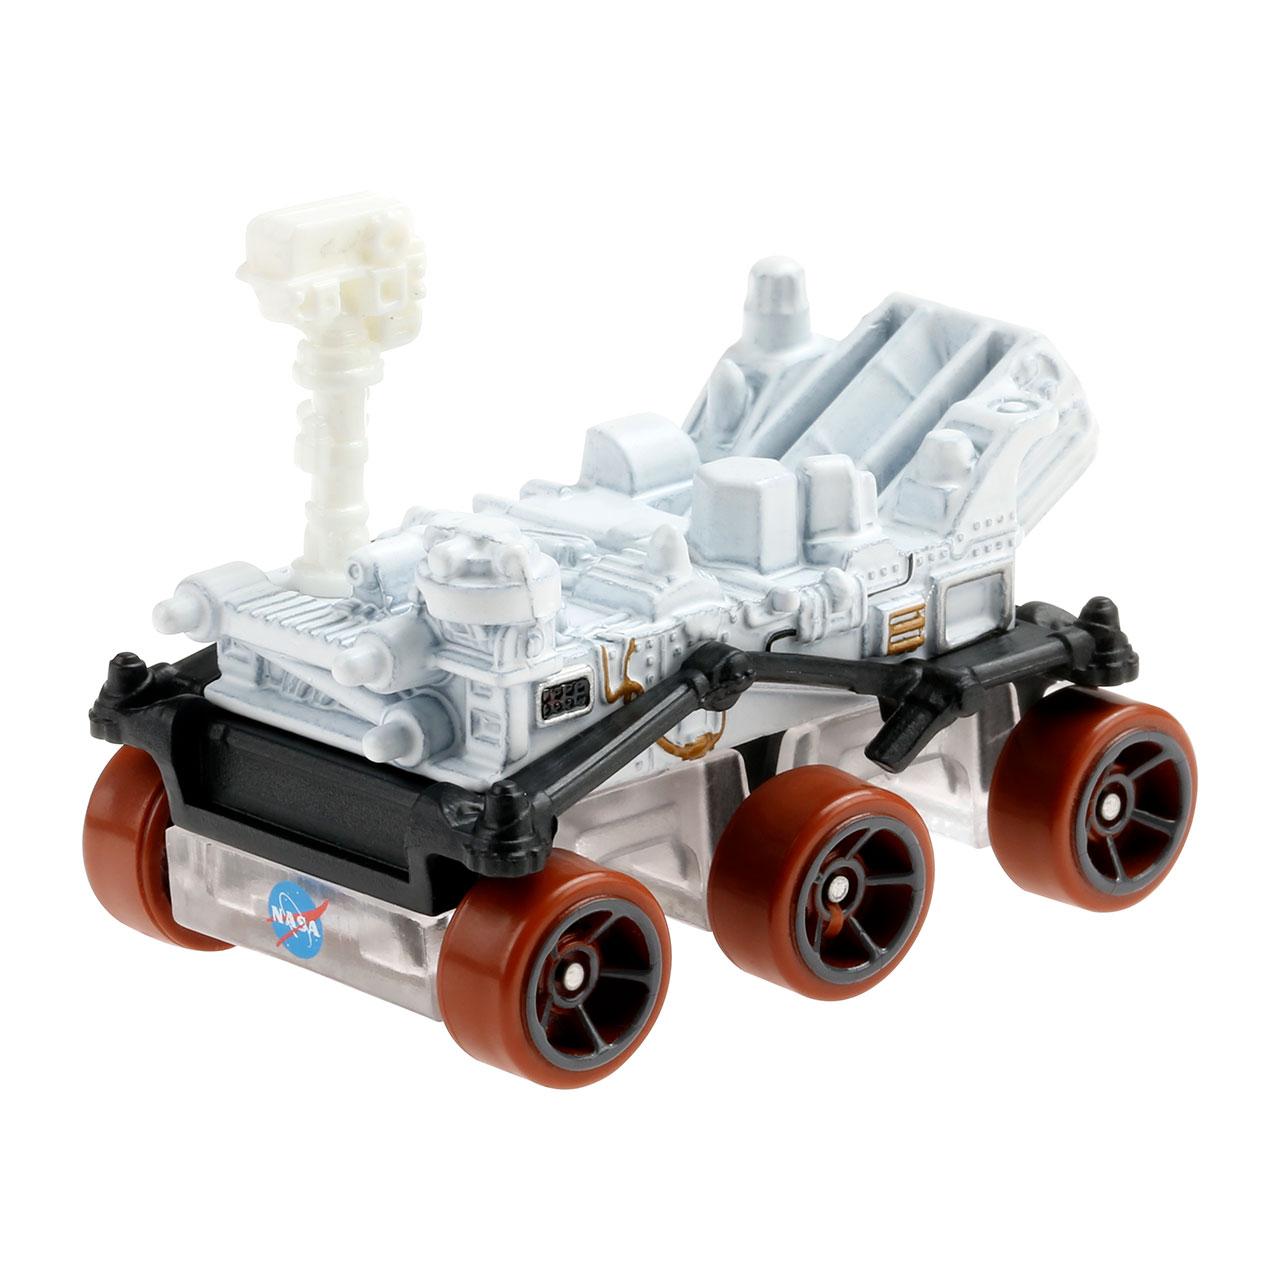 Hot Wheels Mars Perseverance Rover comprend un mât de caméra rotatif et un brun rougeâtre